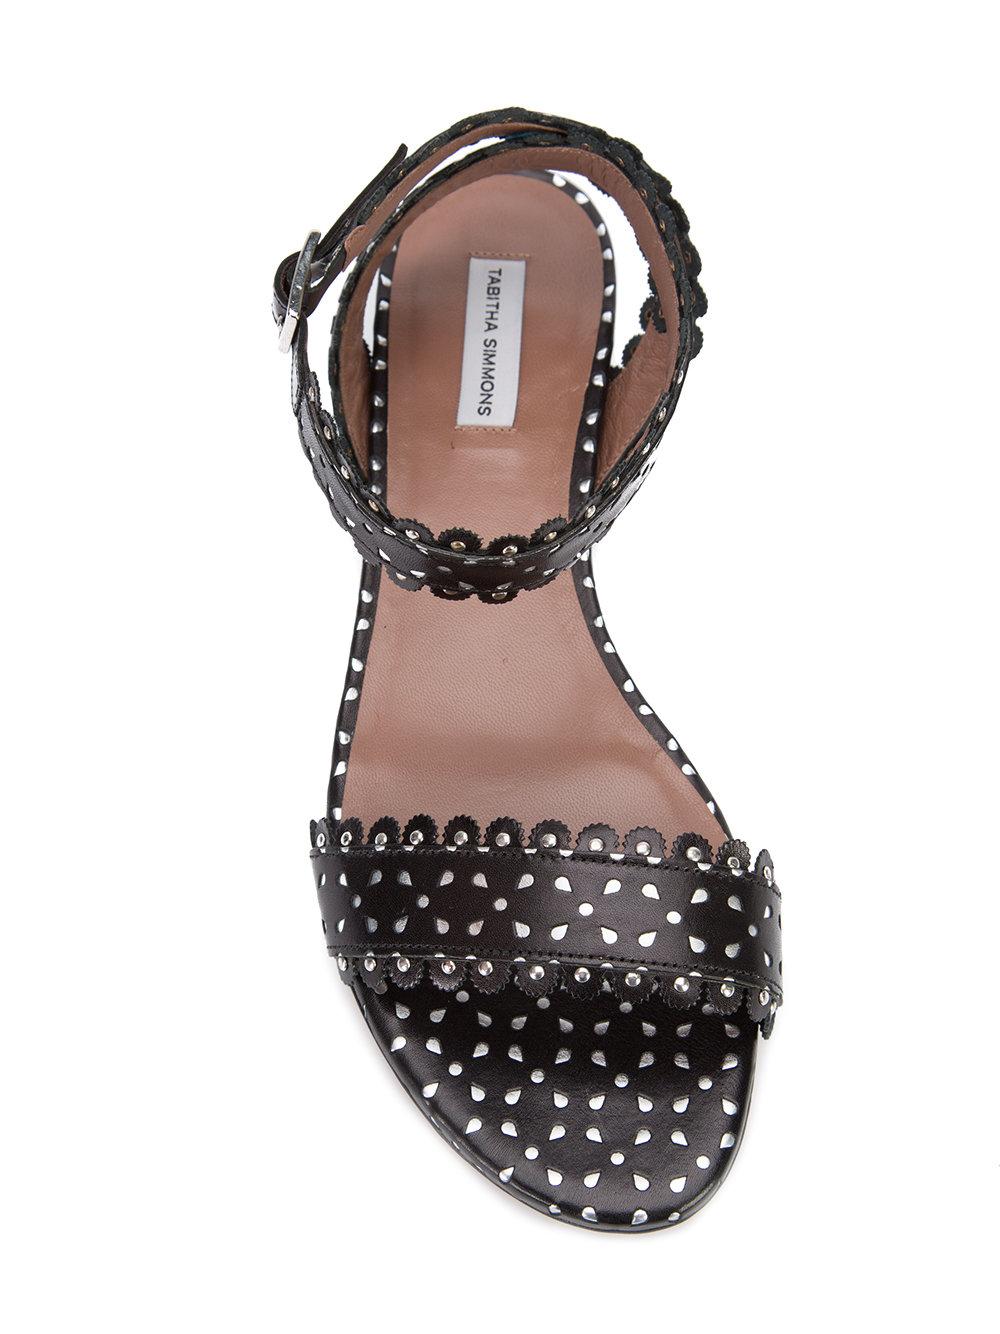 Beautiful Tabitha Simmons Bailee Suede Shoes | Enjoyable Tabitha Simmons Hermione